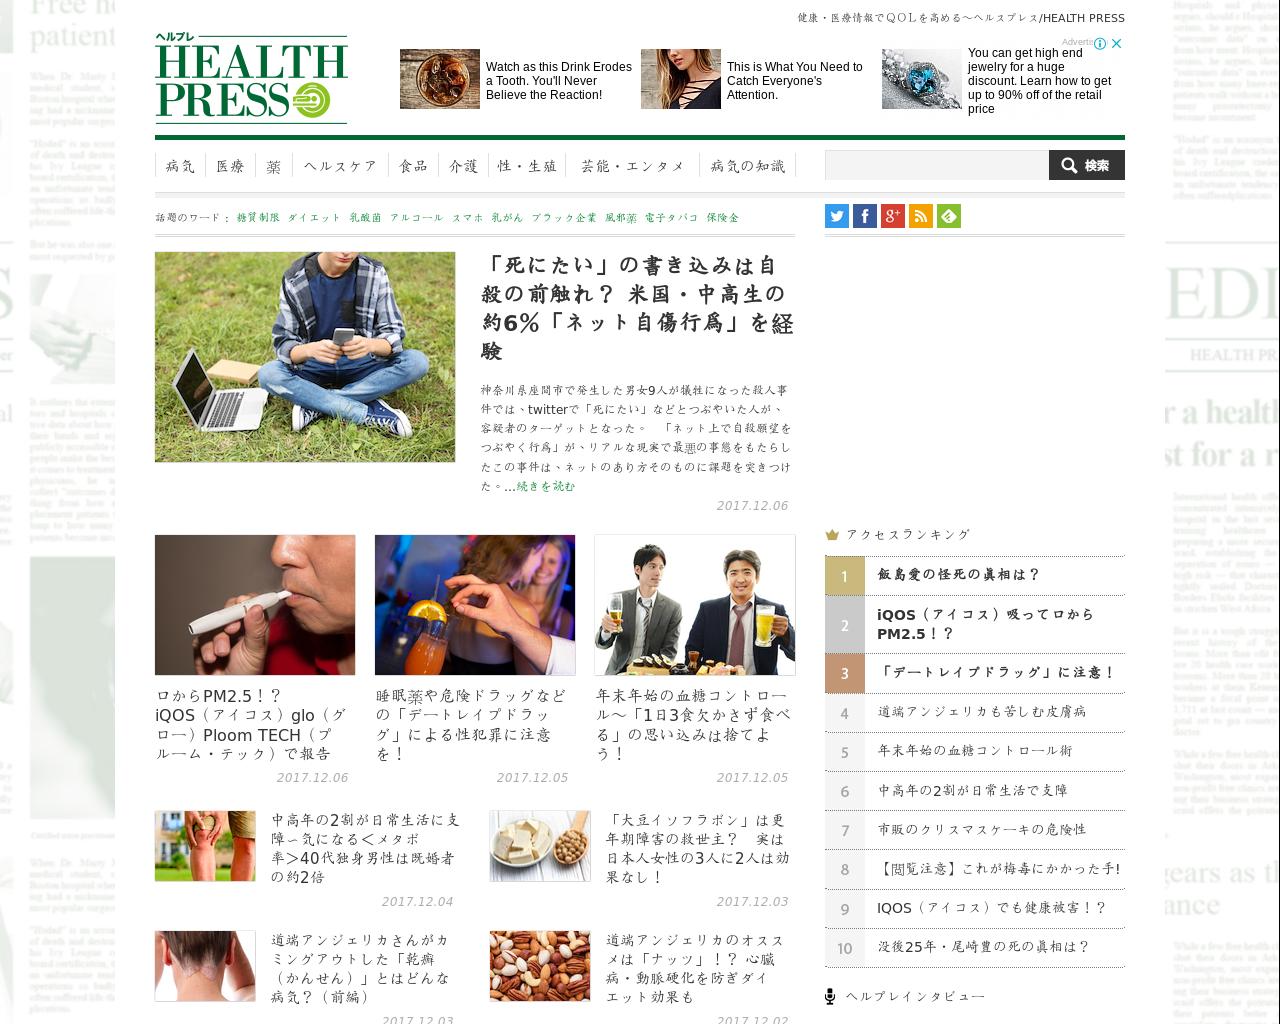 healthpress.jp(2017/12/07 01:55:31)